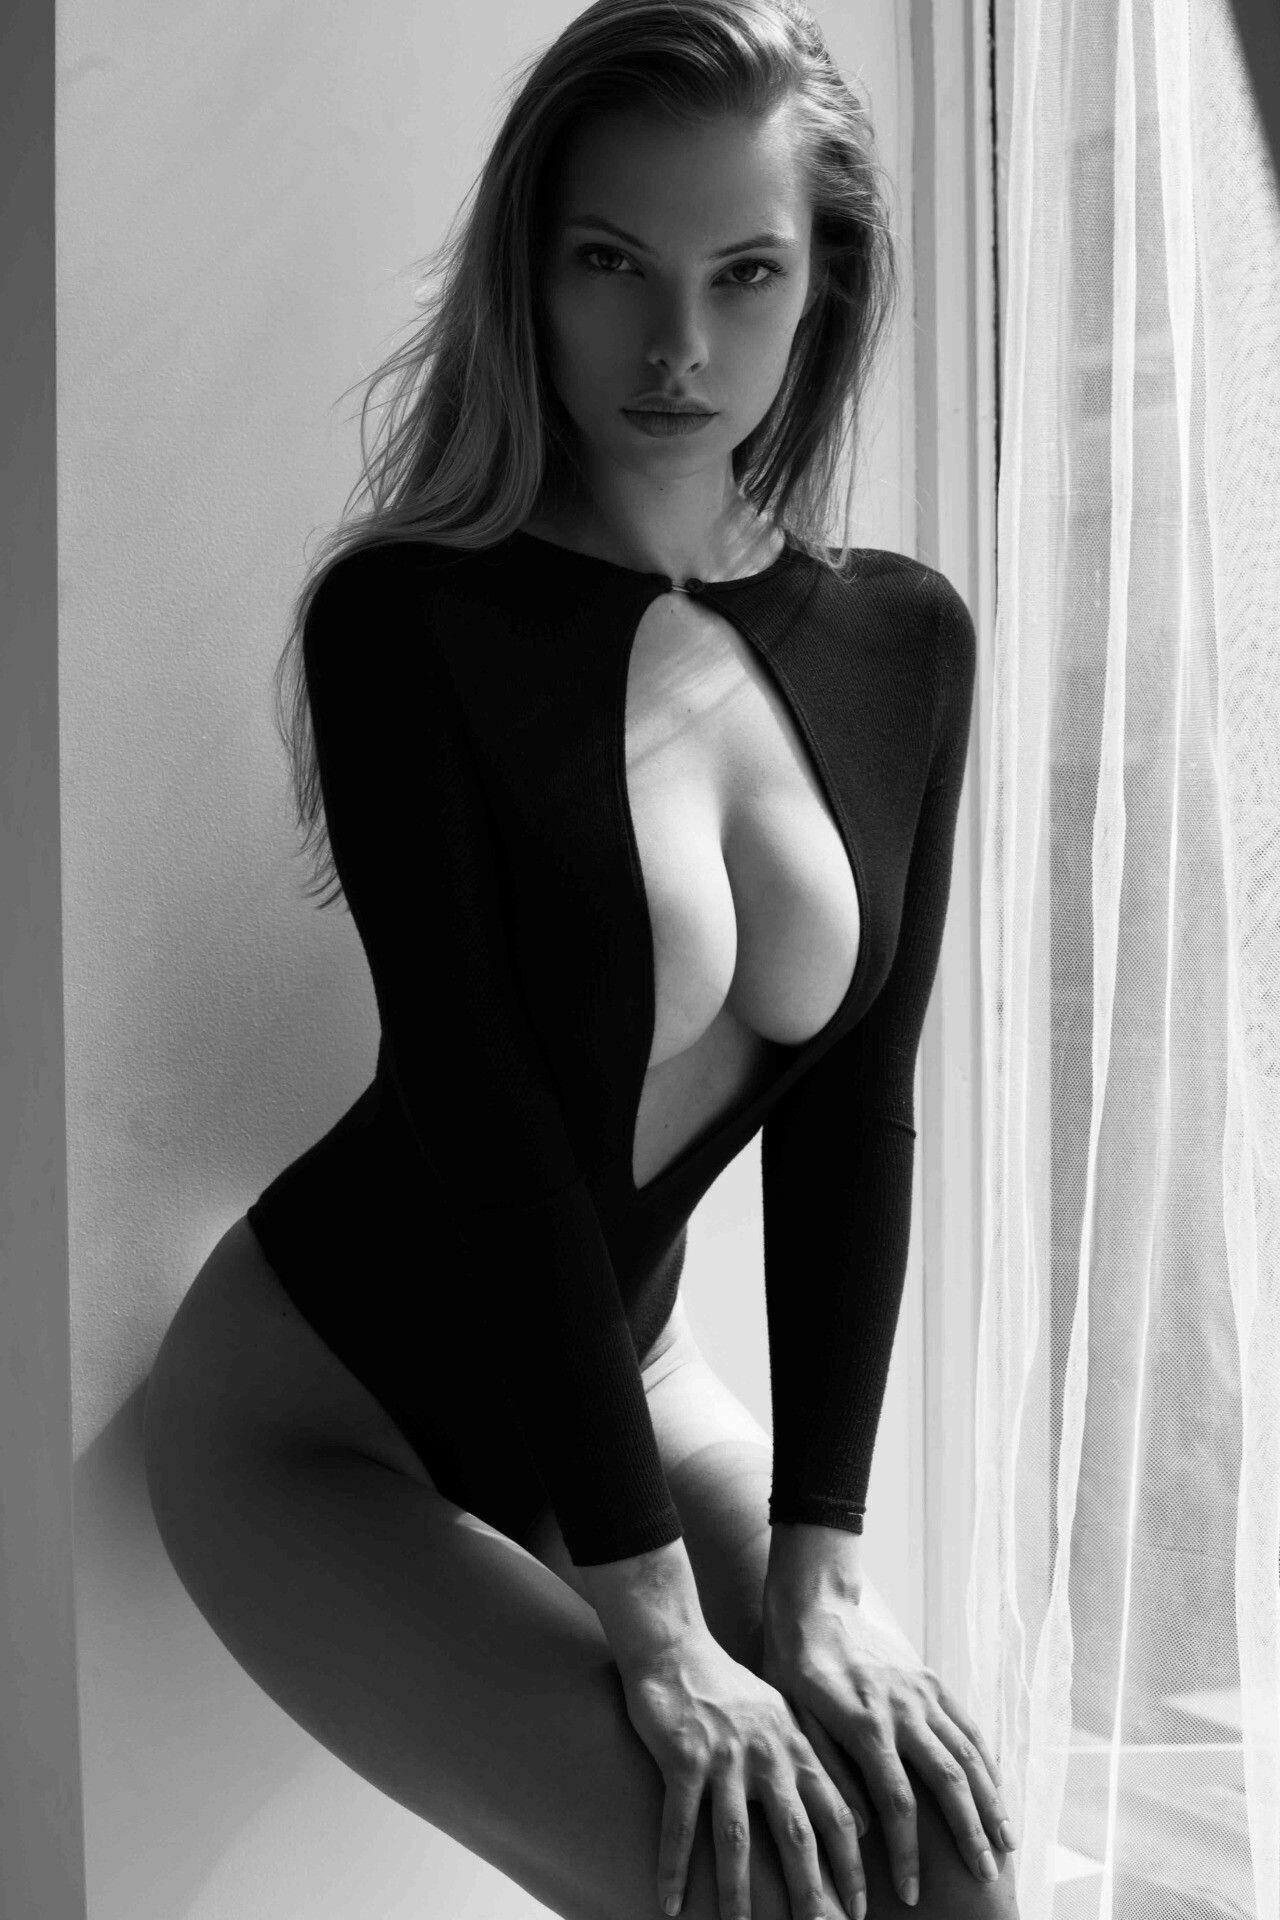 braless Hot Dioni Tabber naked photo 2017